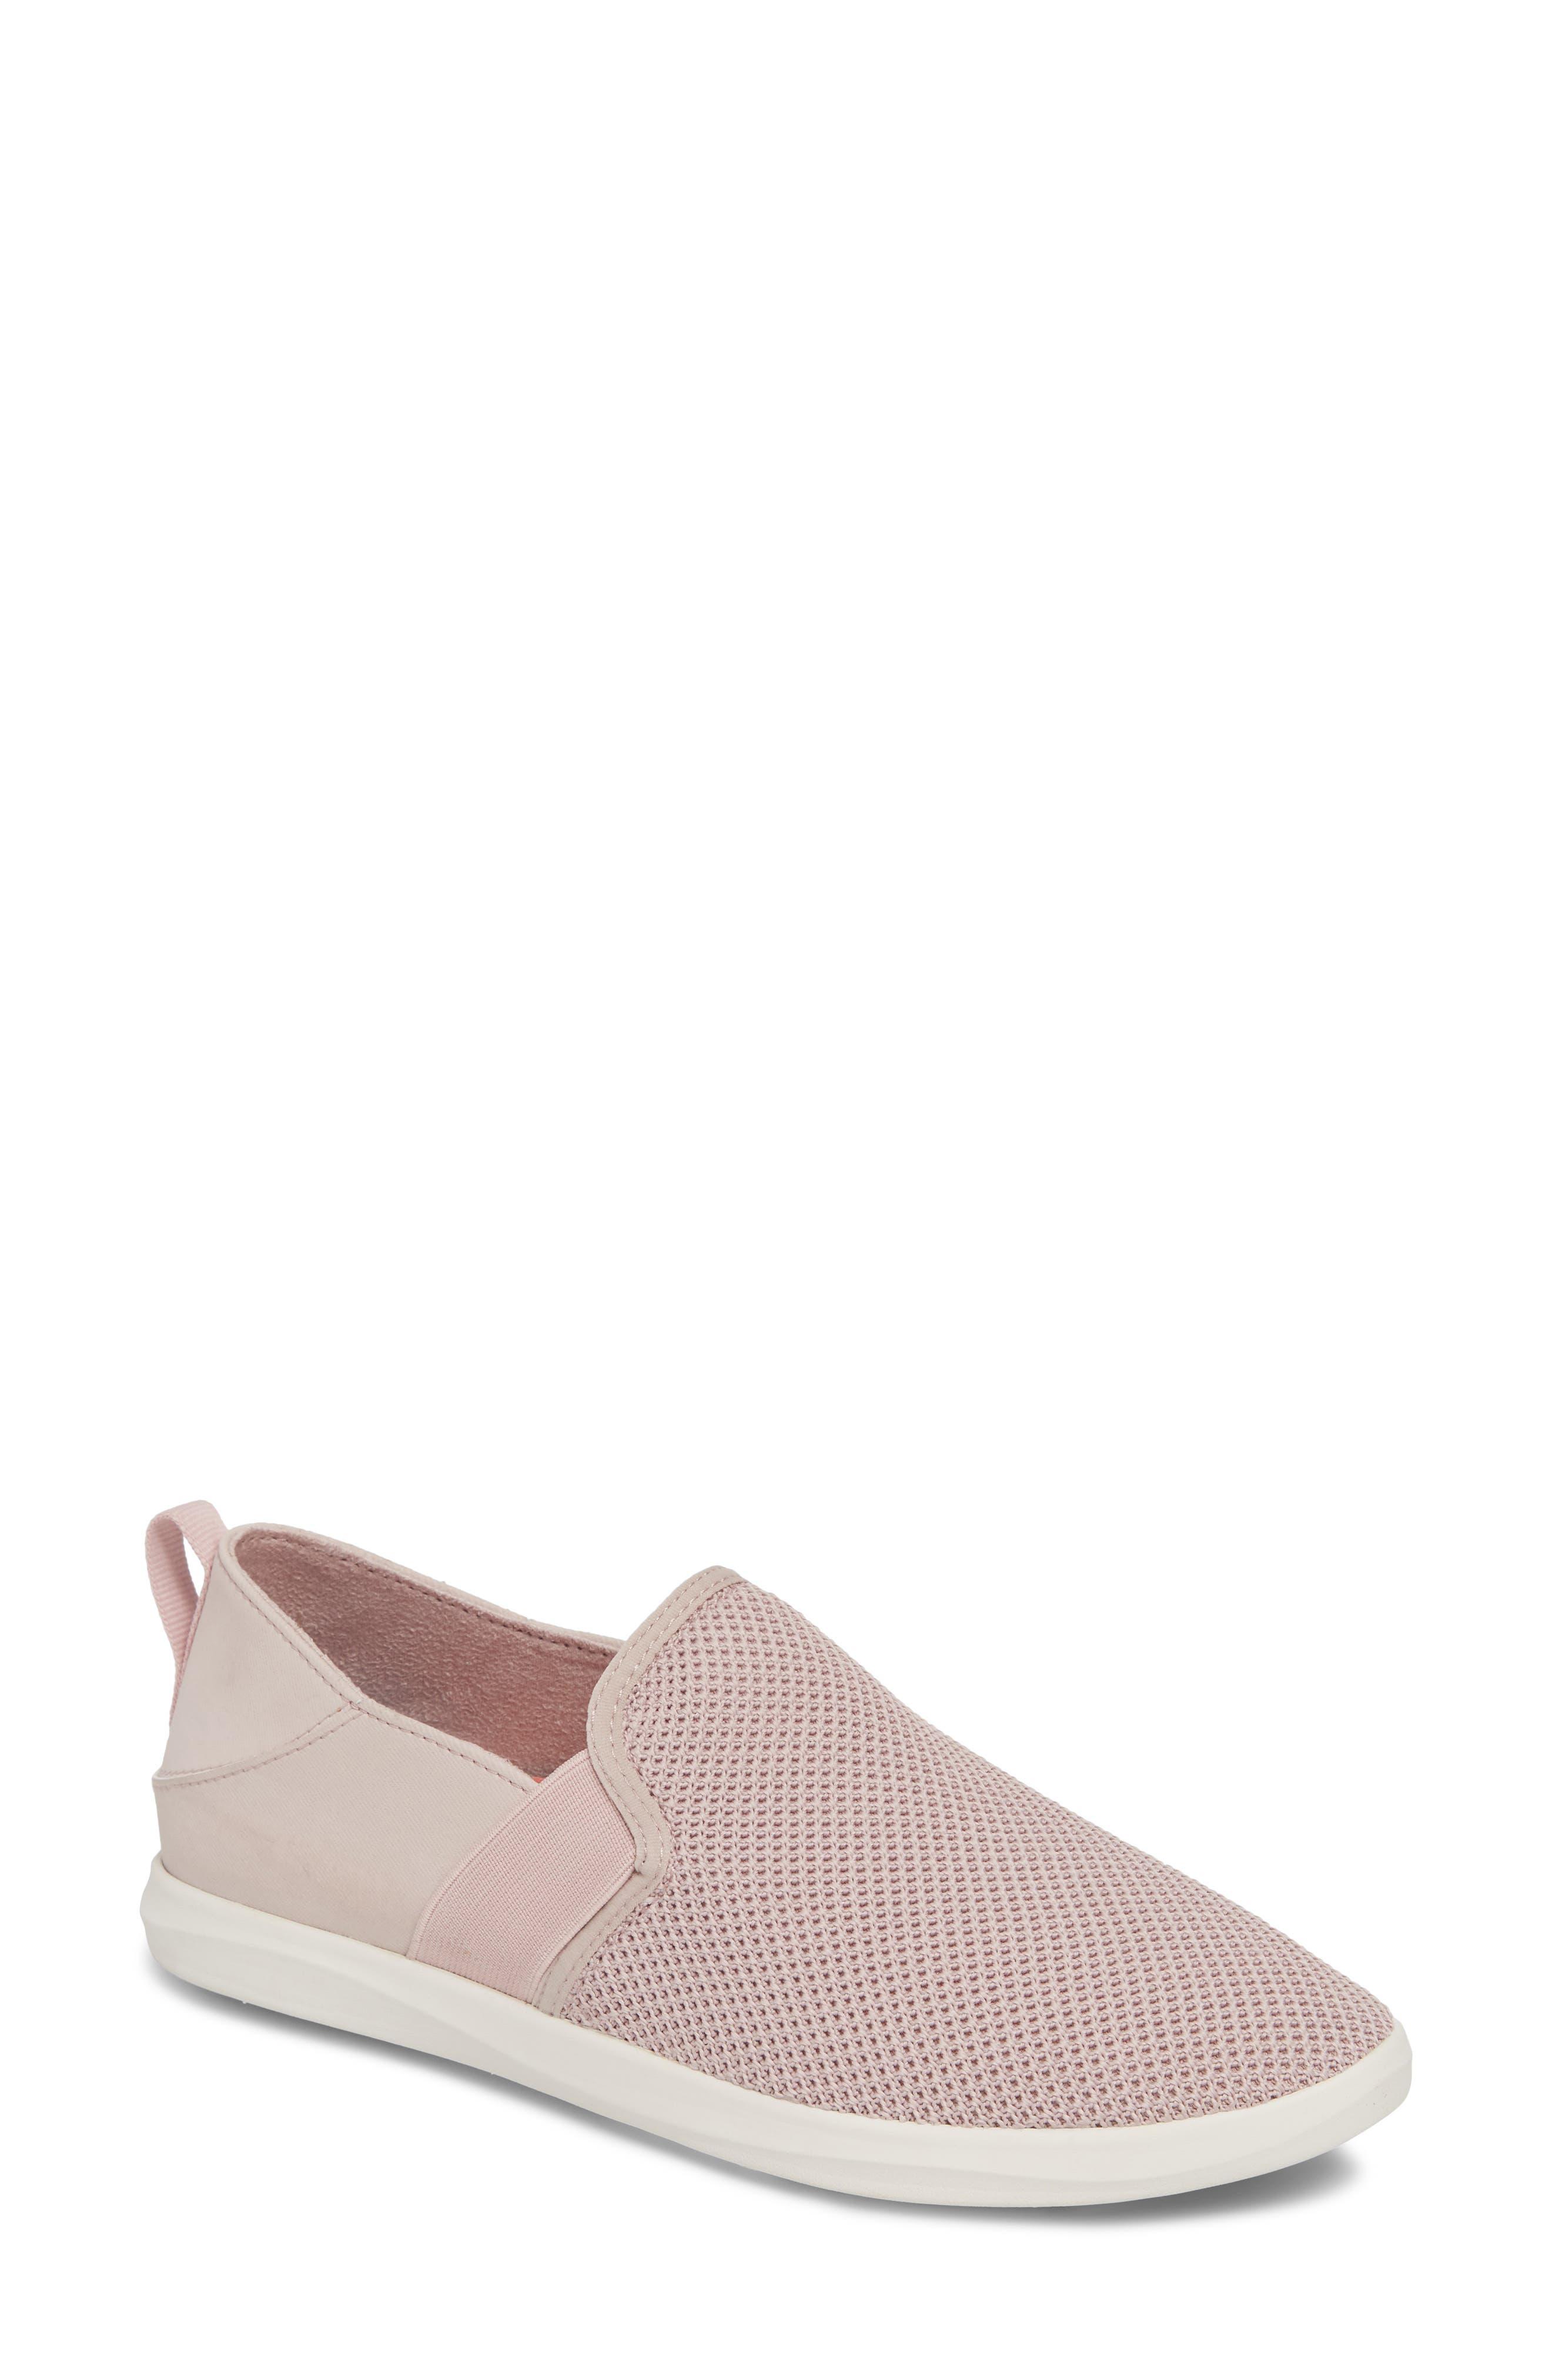 Olukai Haleiwa Pai Sneaker, Pink